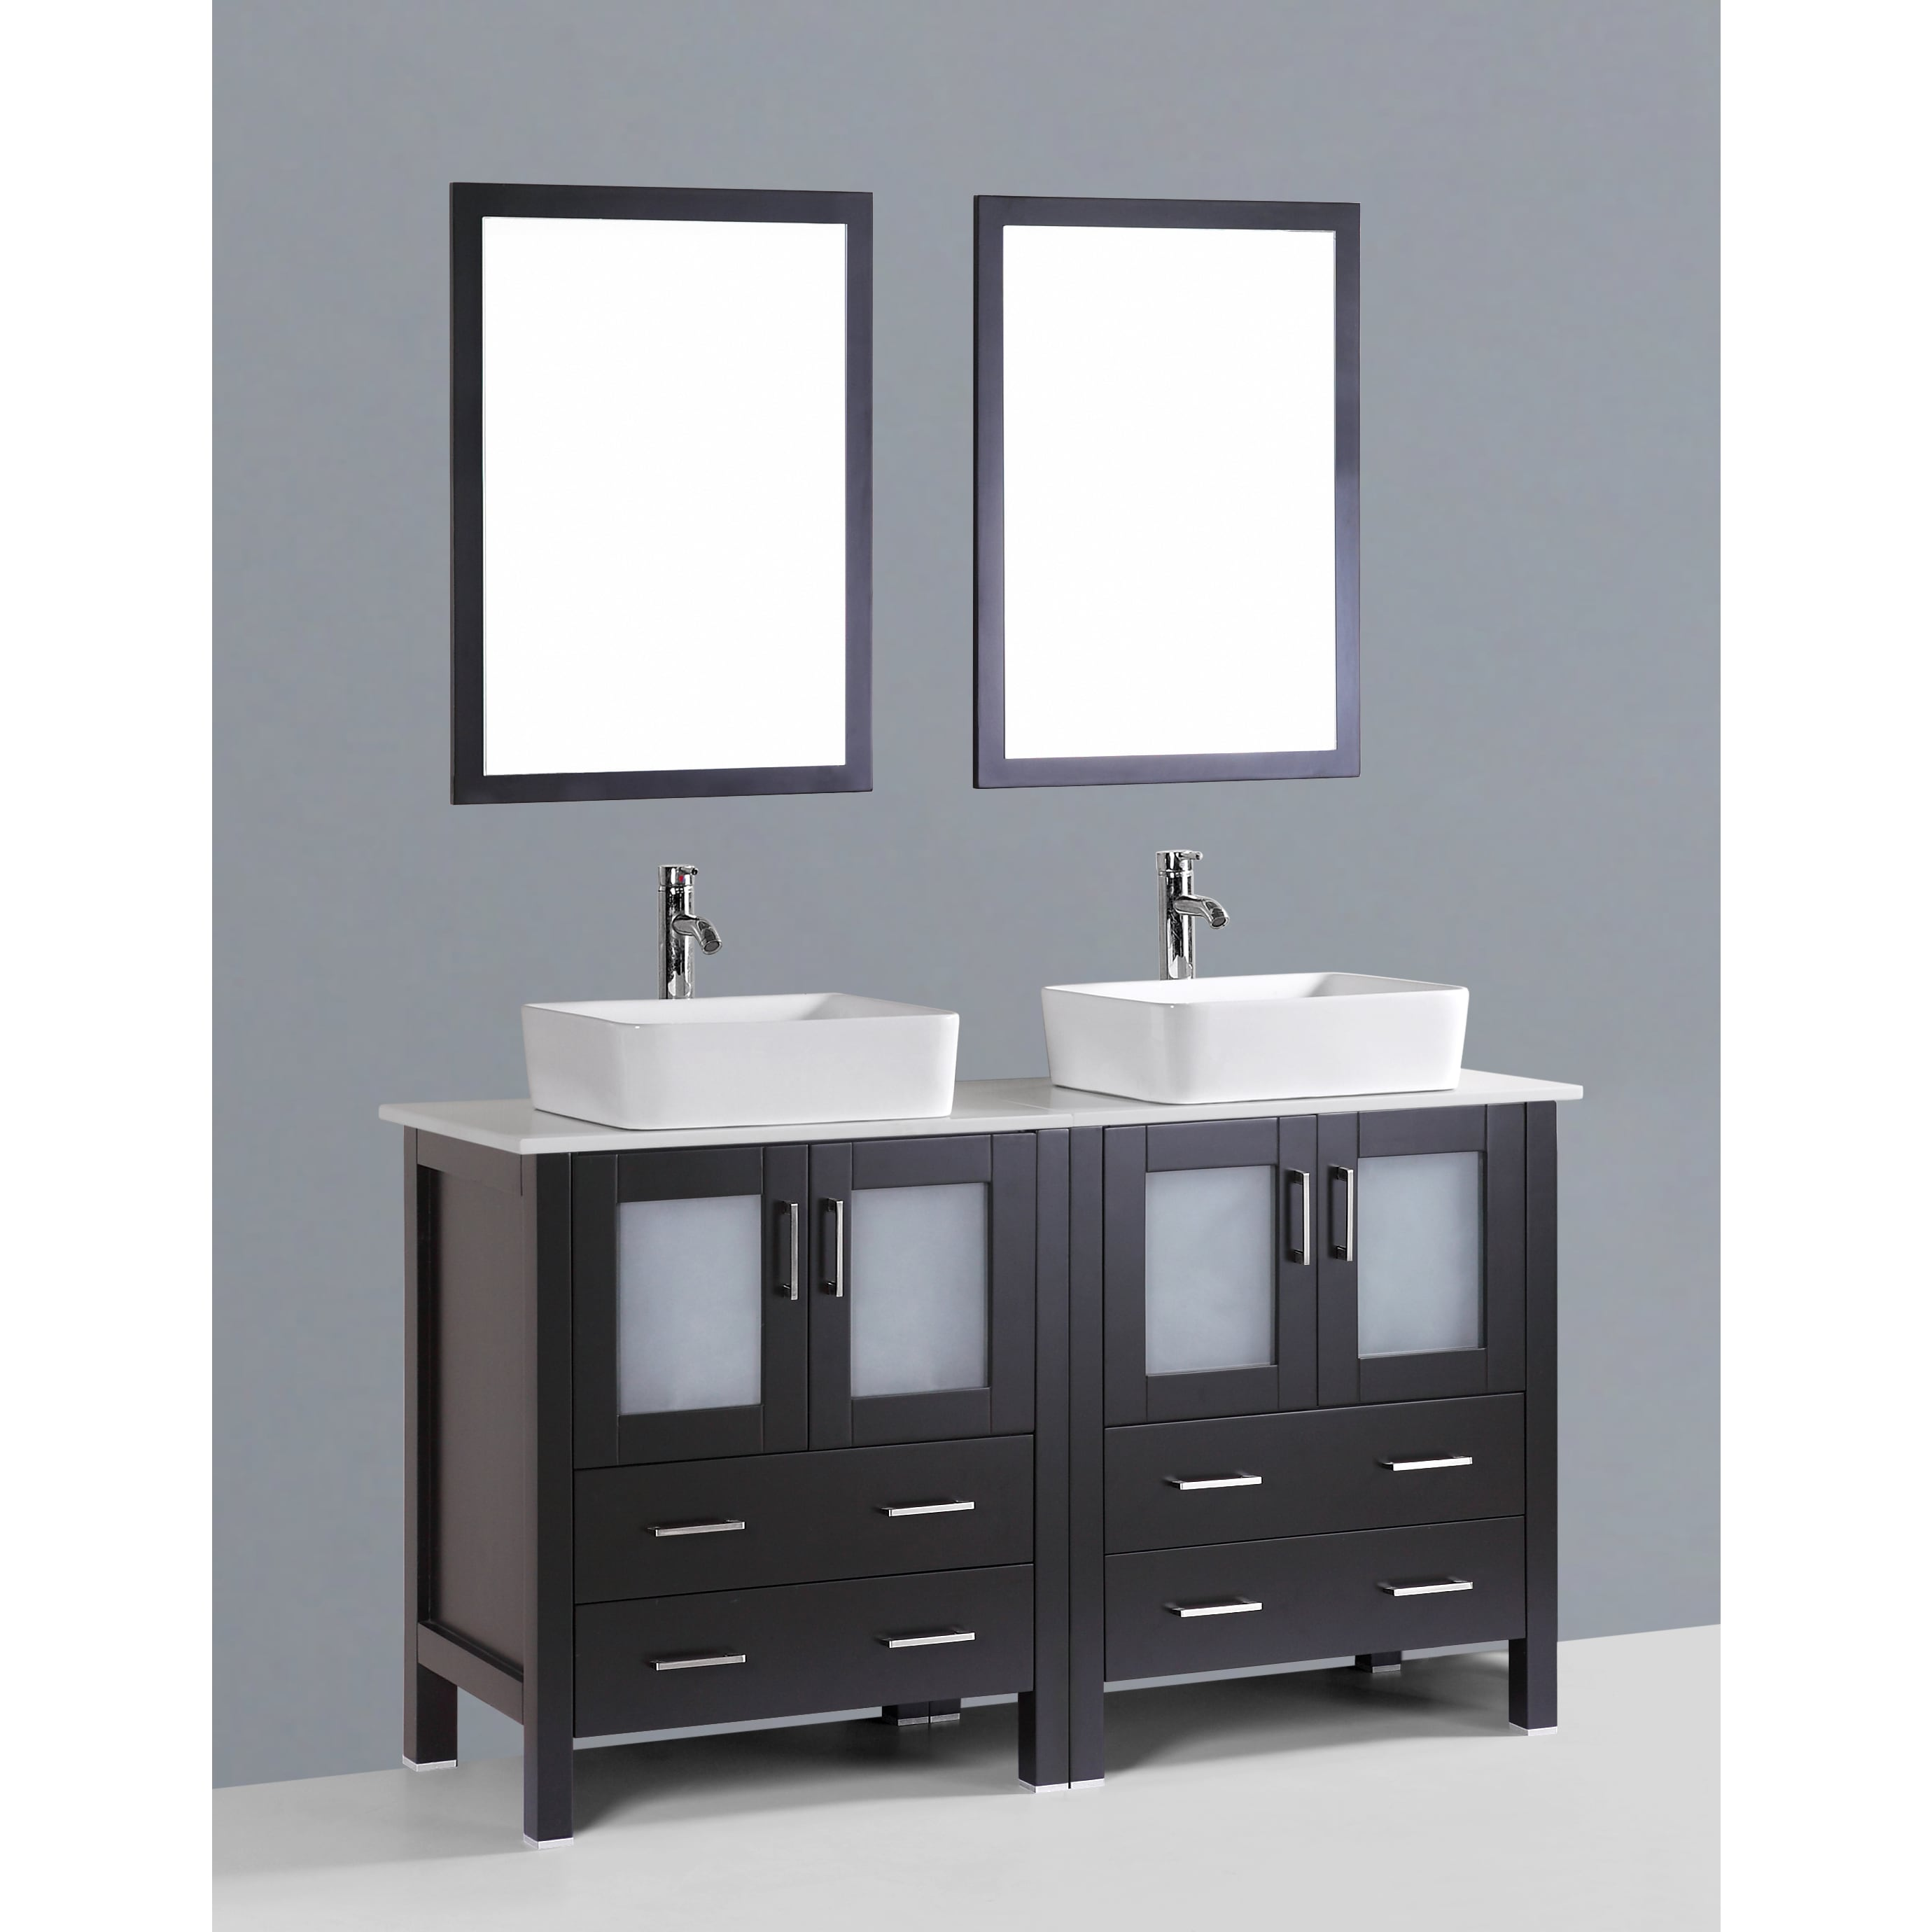 Bosconi Bathroom Vanities & Vanity Cabinets For Less